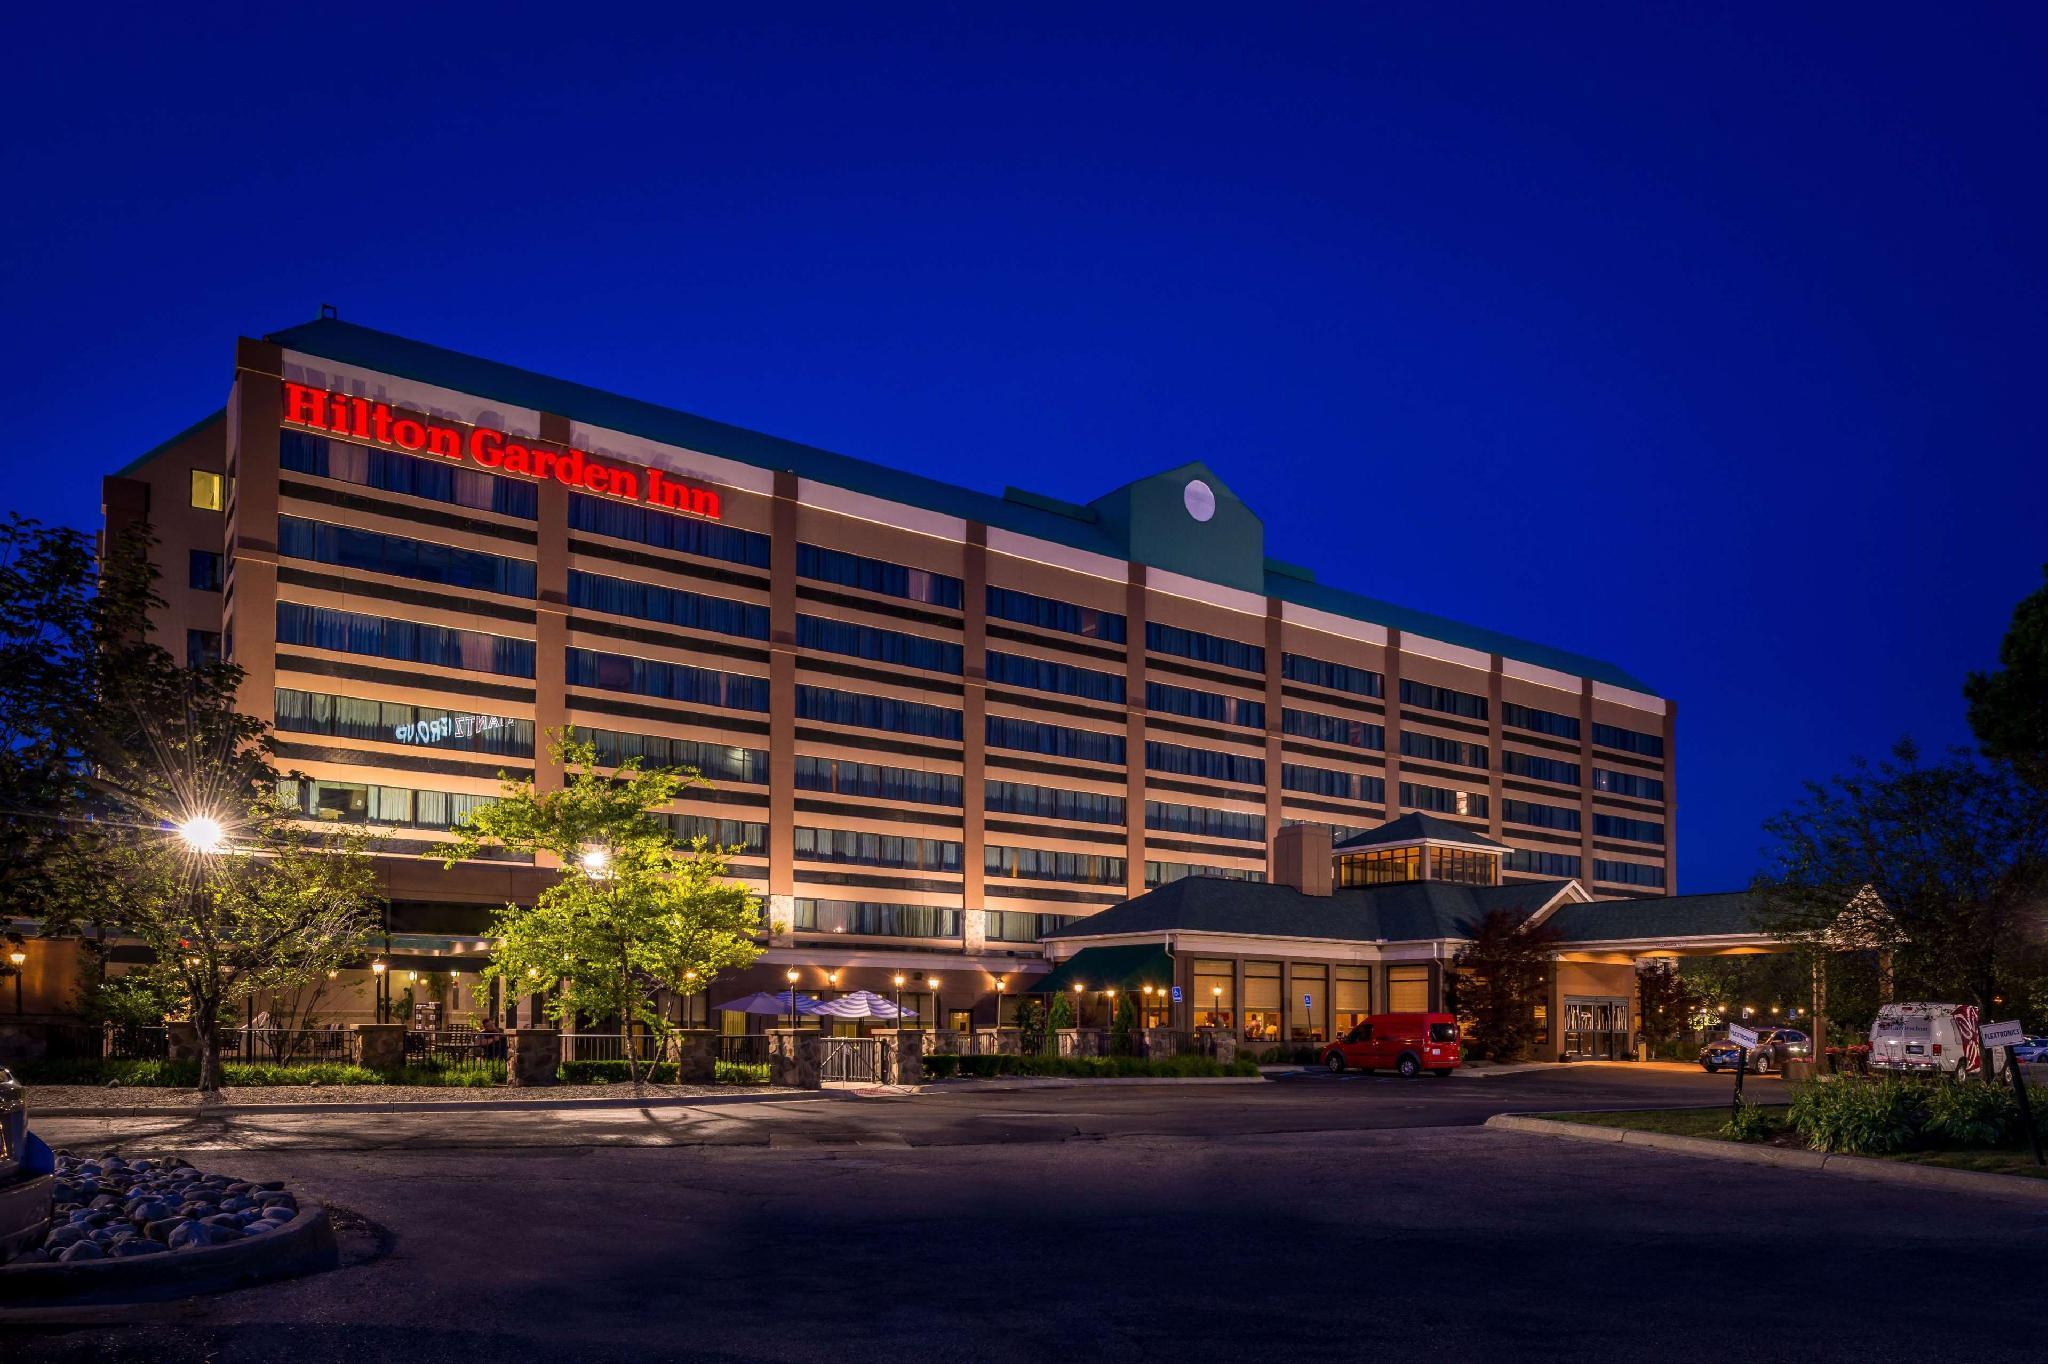 Hilton Garden Inn Detroit Southfield